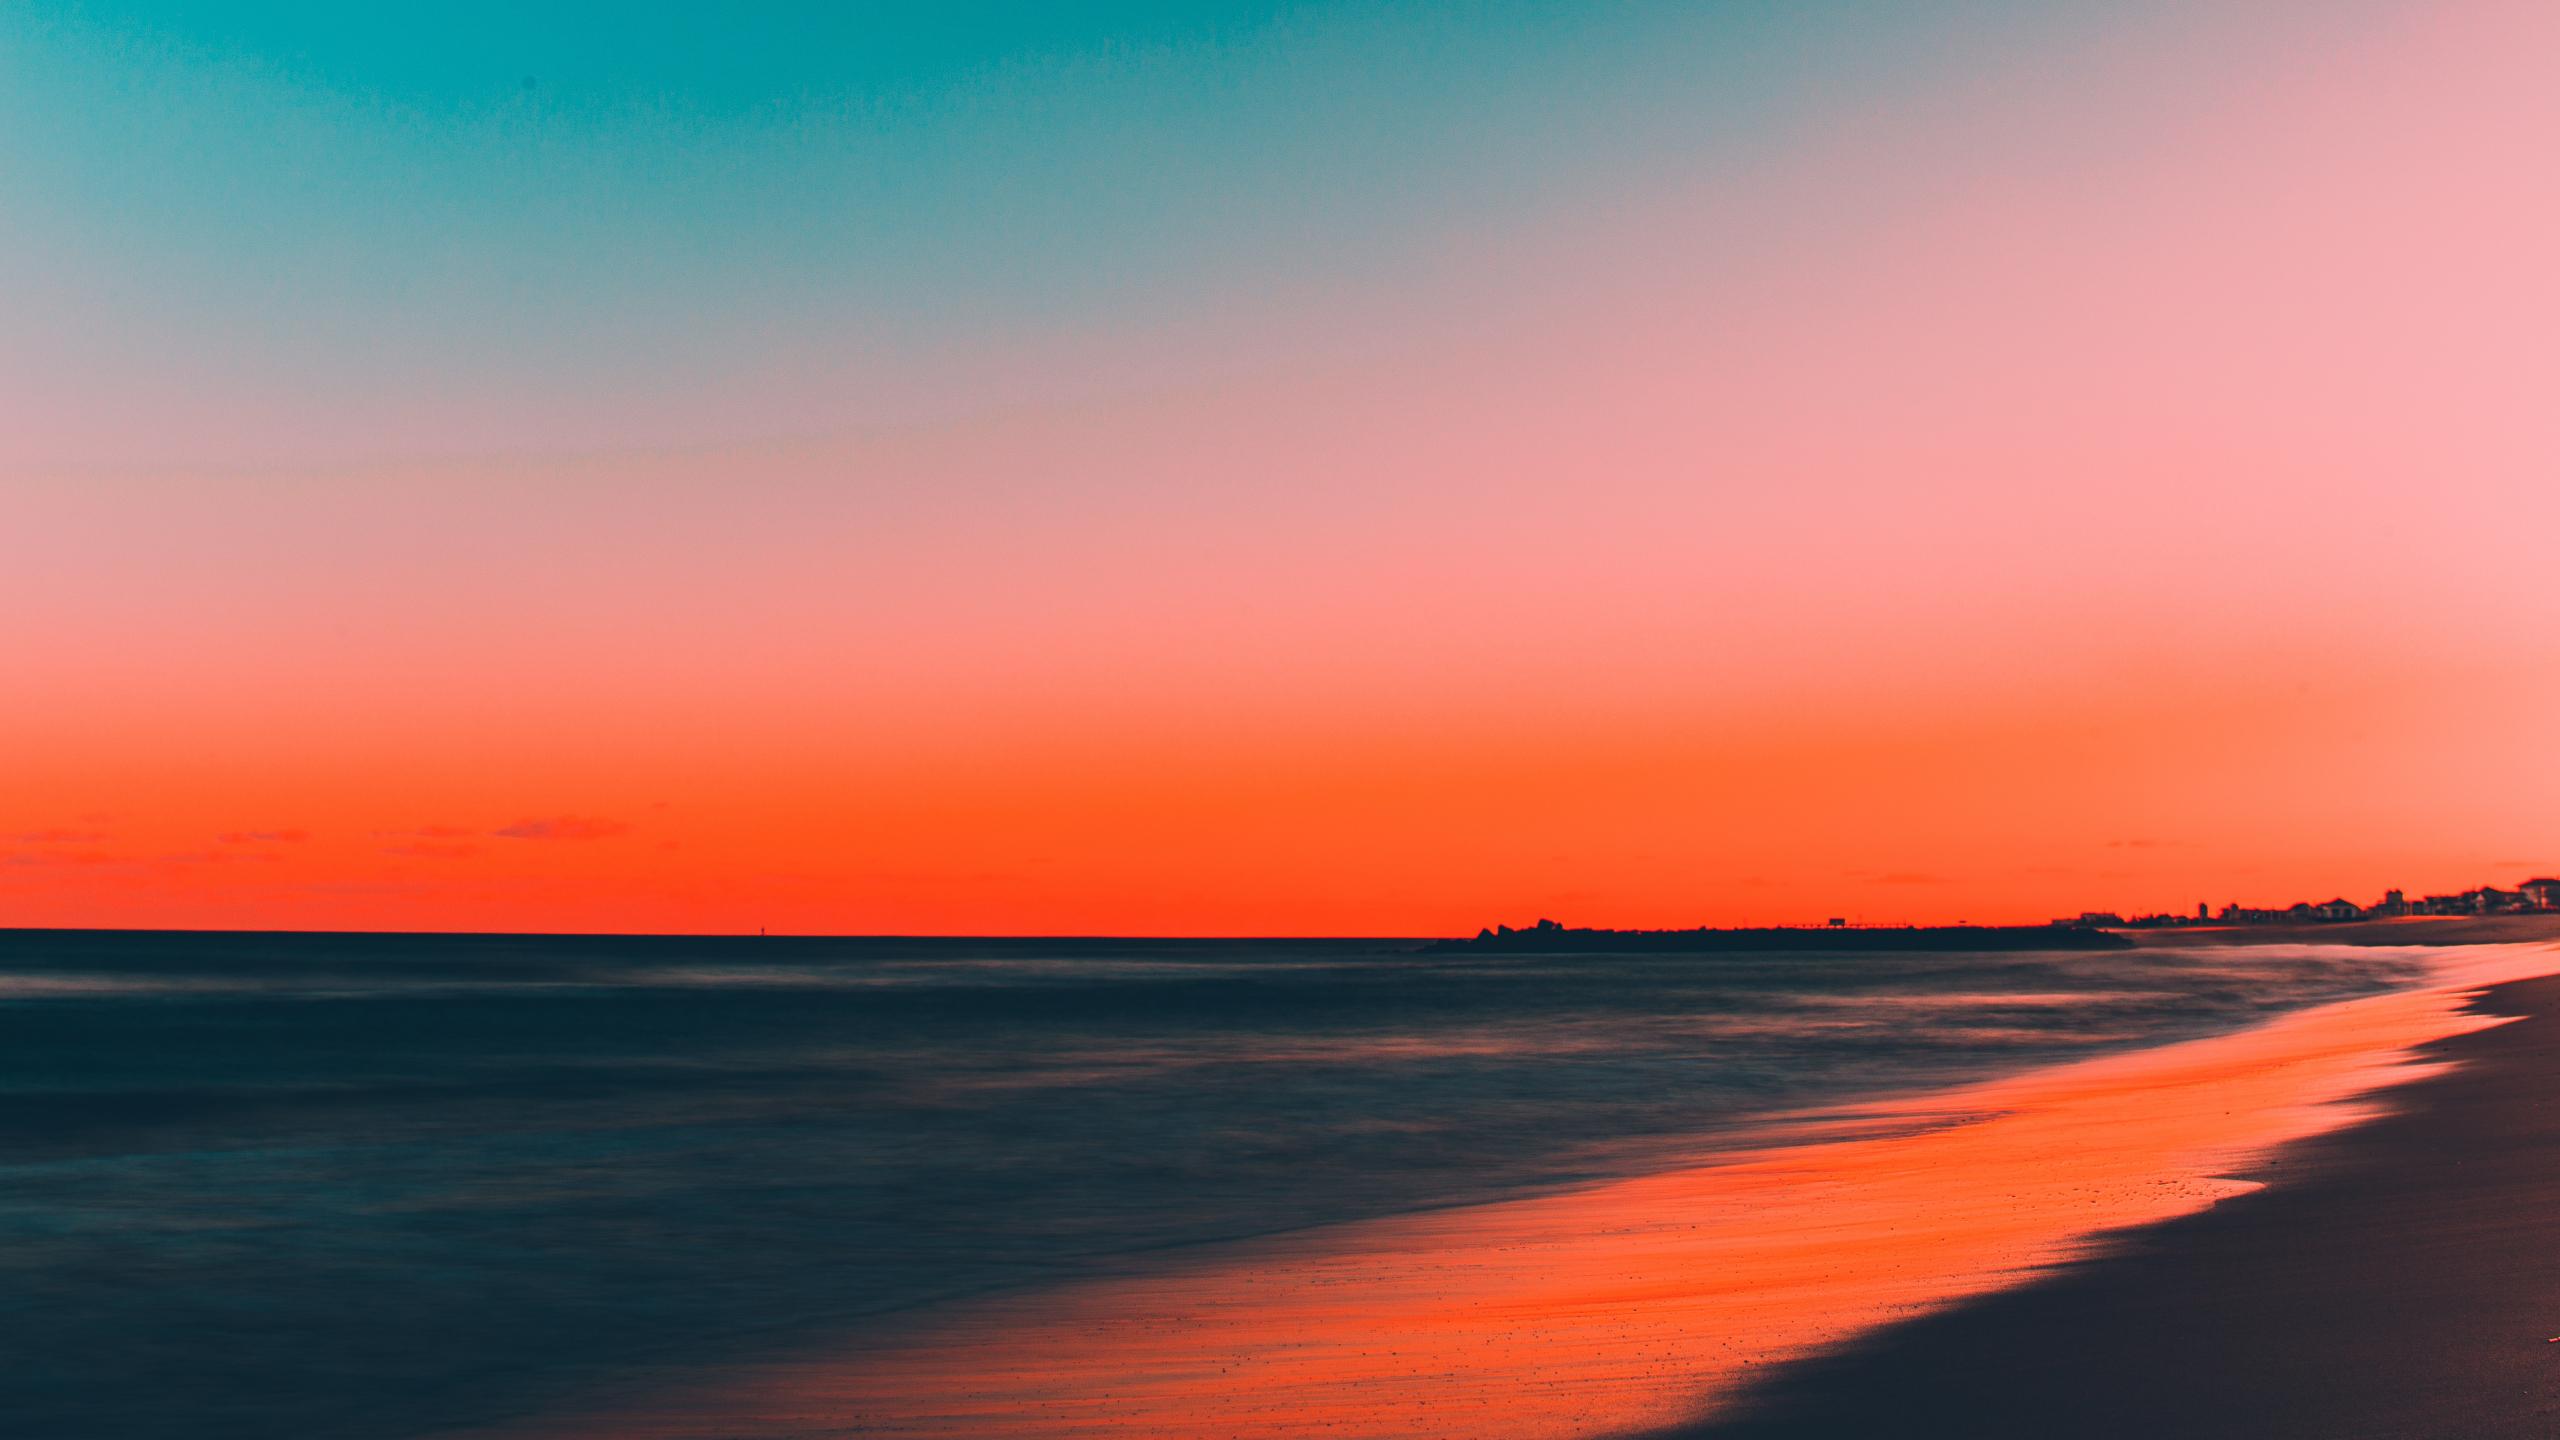 Download 2560x1440 Wallpaper Beach Clean Sky Skyline